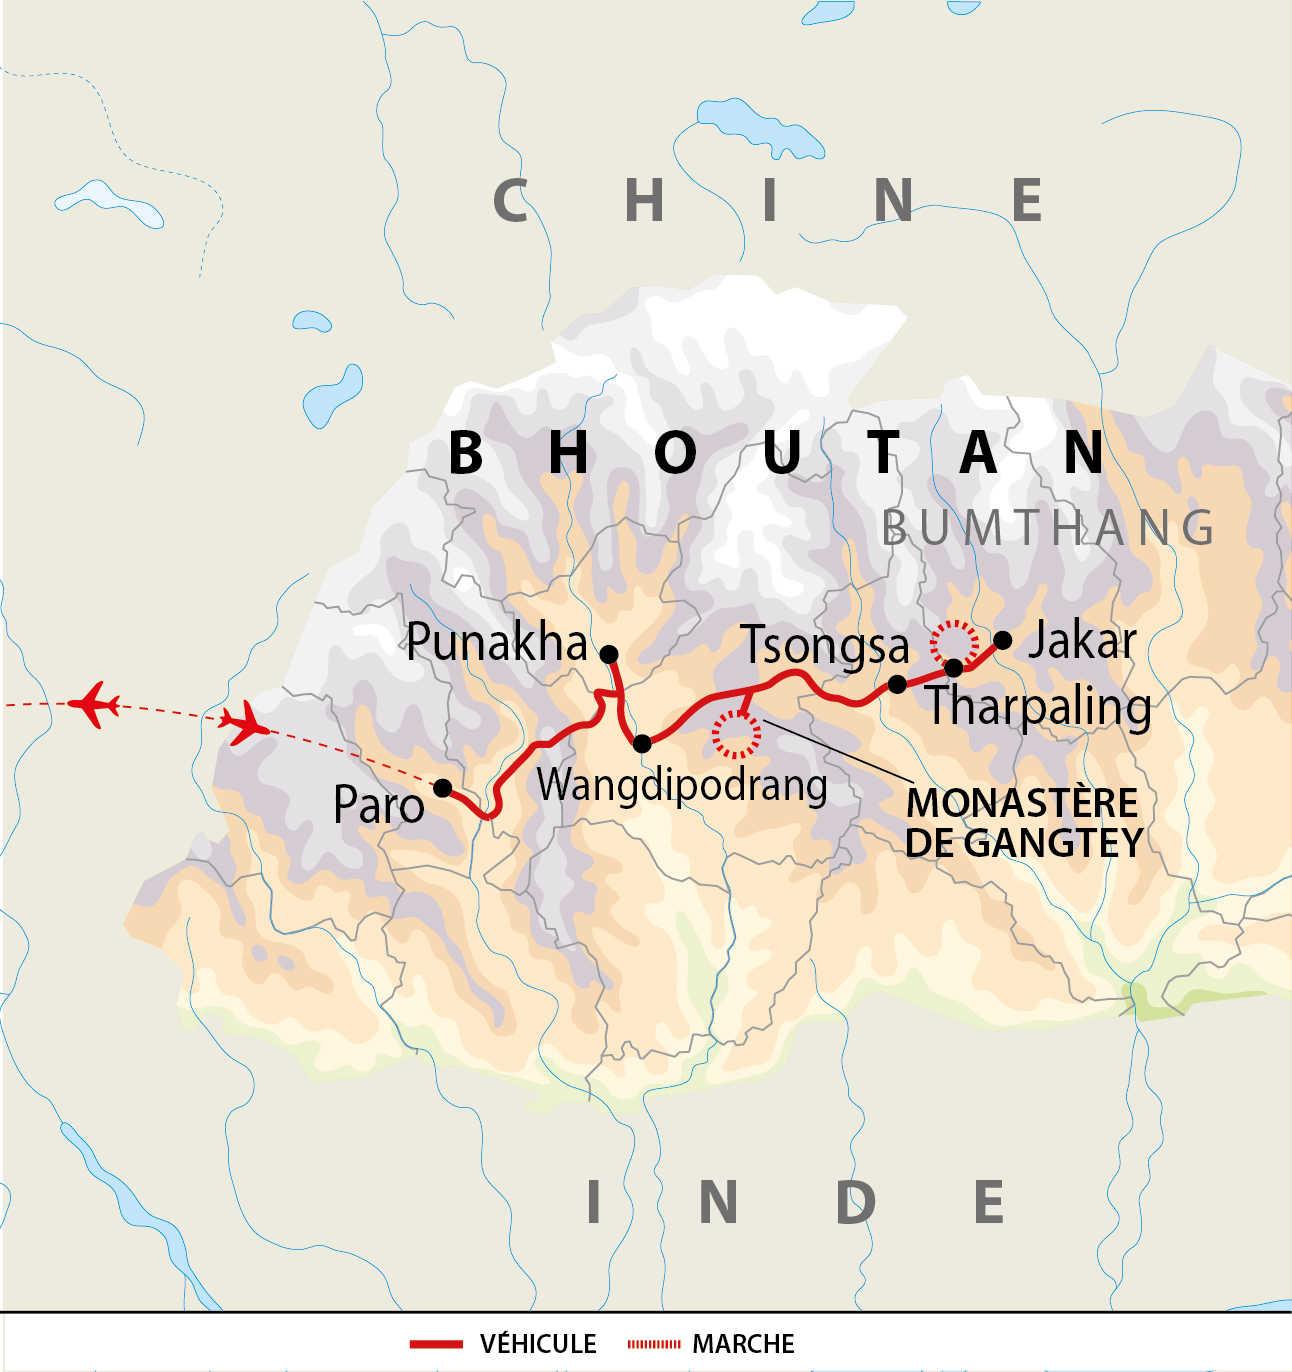 Carte de voyage festival au Bhoutan